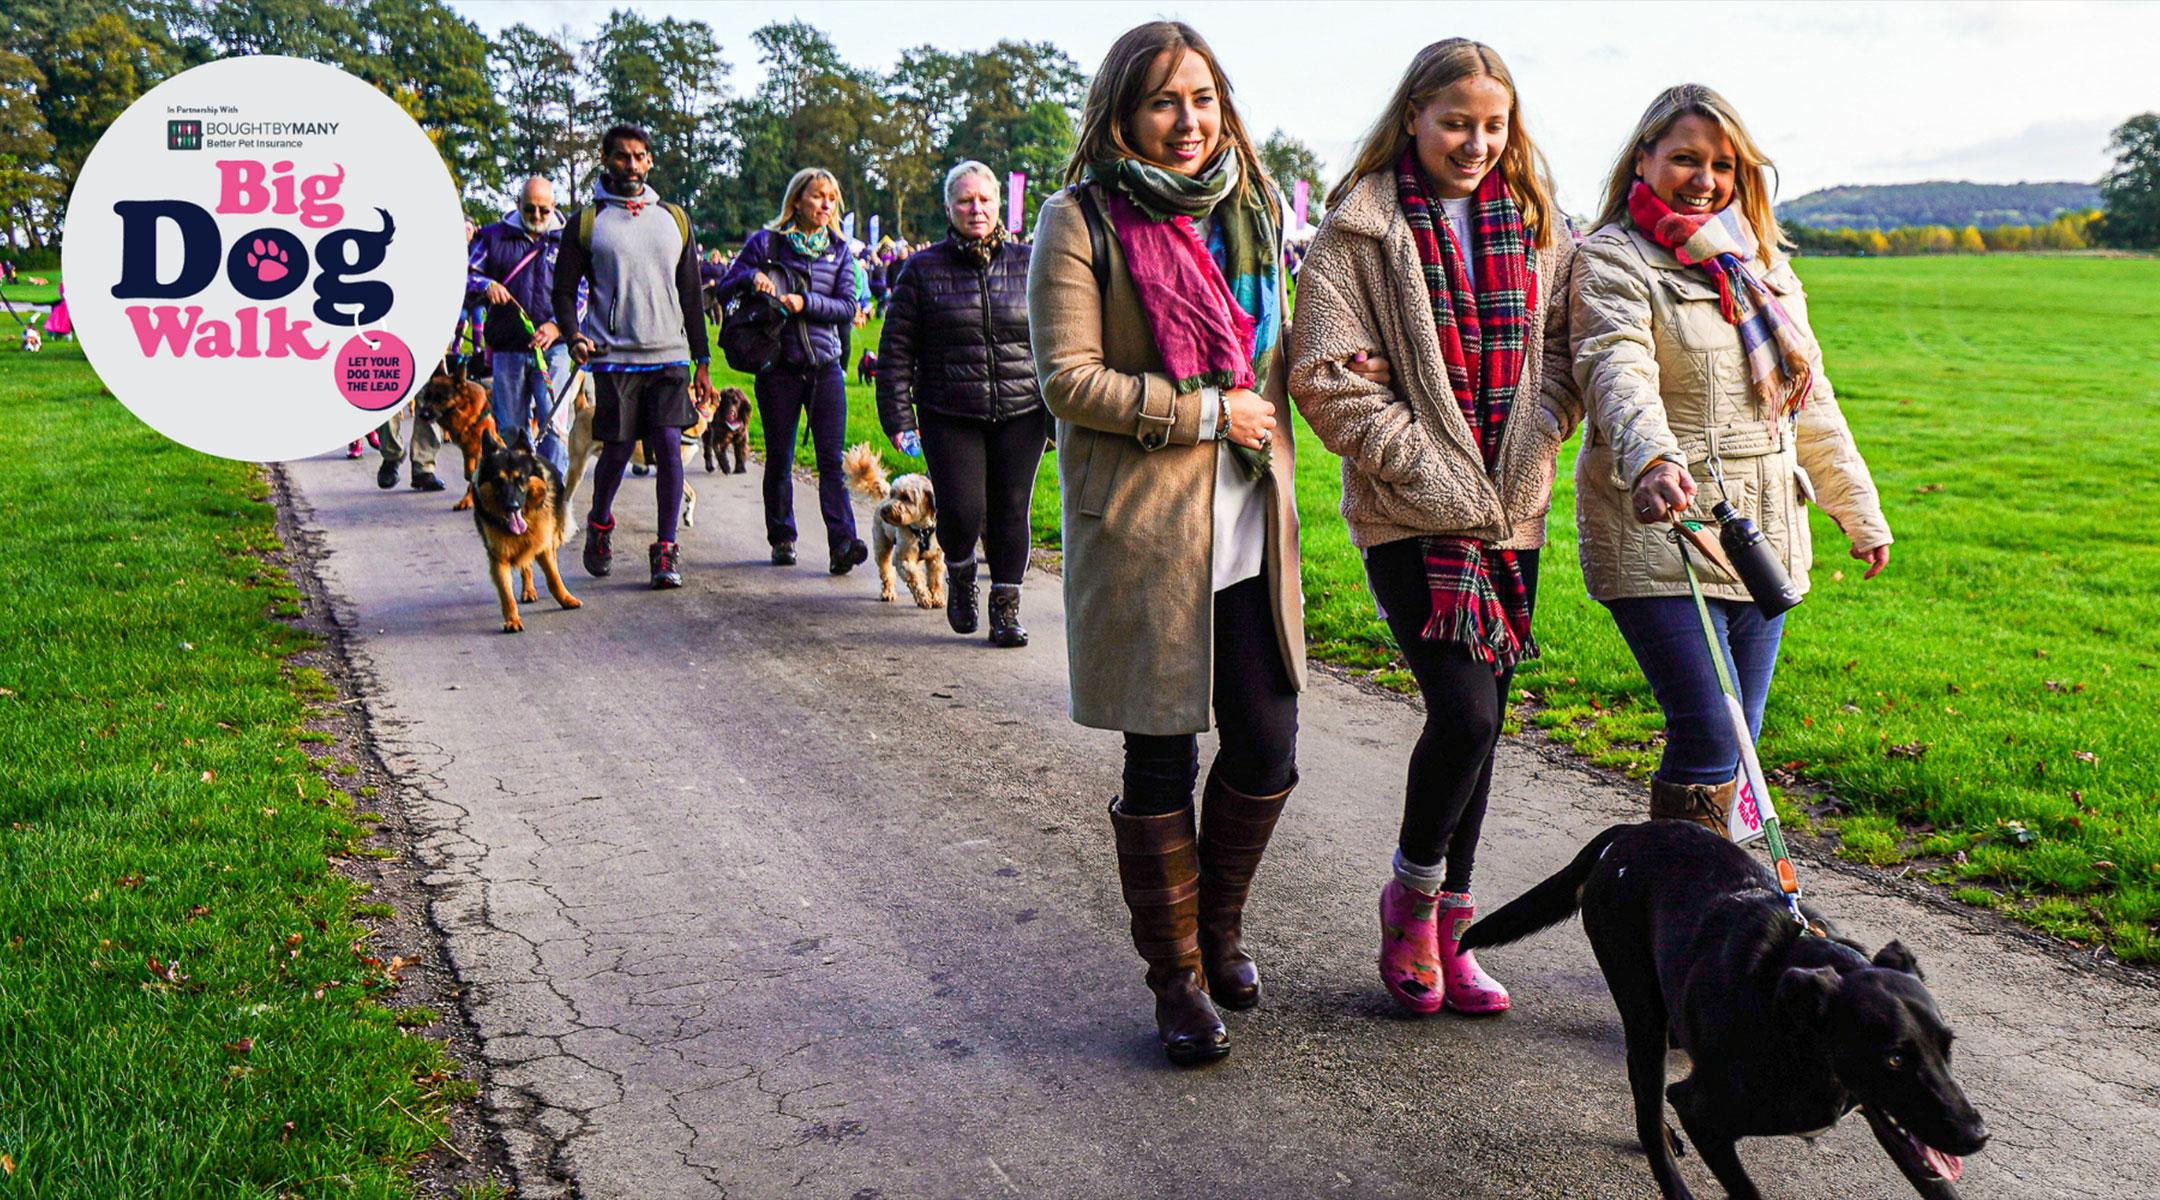 Big Dog Walk Yorkshire - 27 June